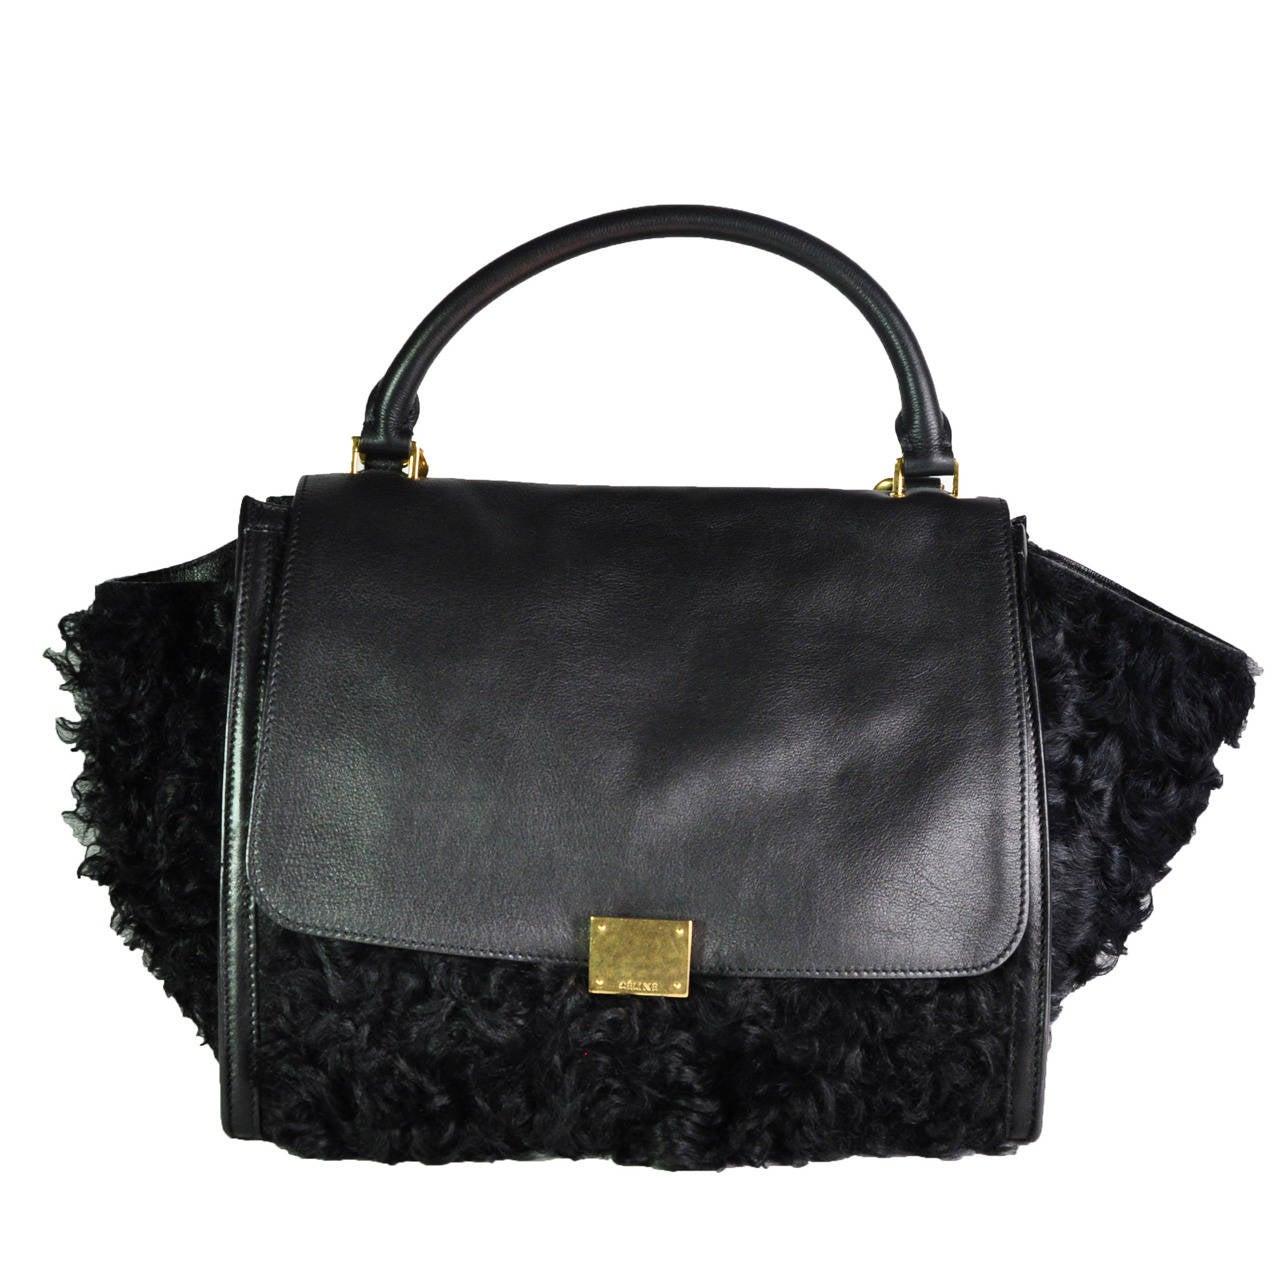 I-O-ME-Designers.com Ltd. Handbags and Purses - Hong Kong, Hong ...